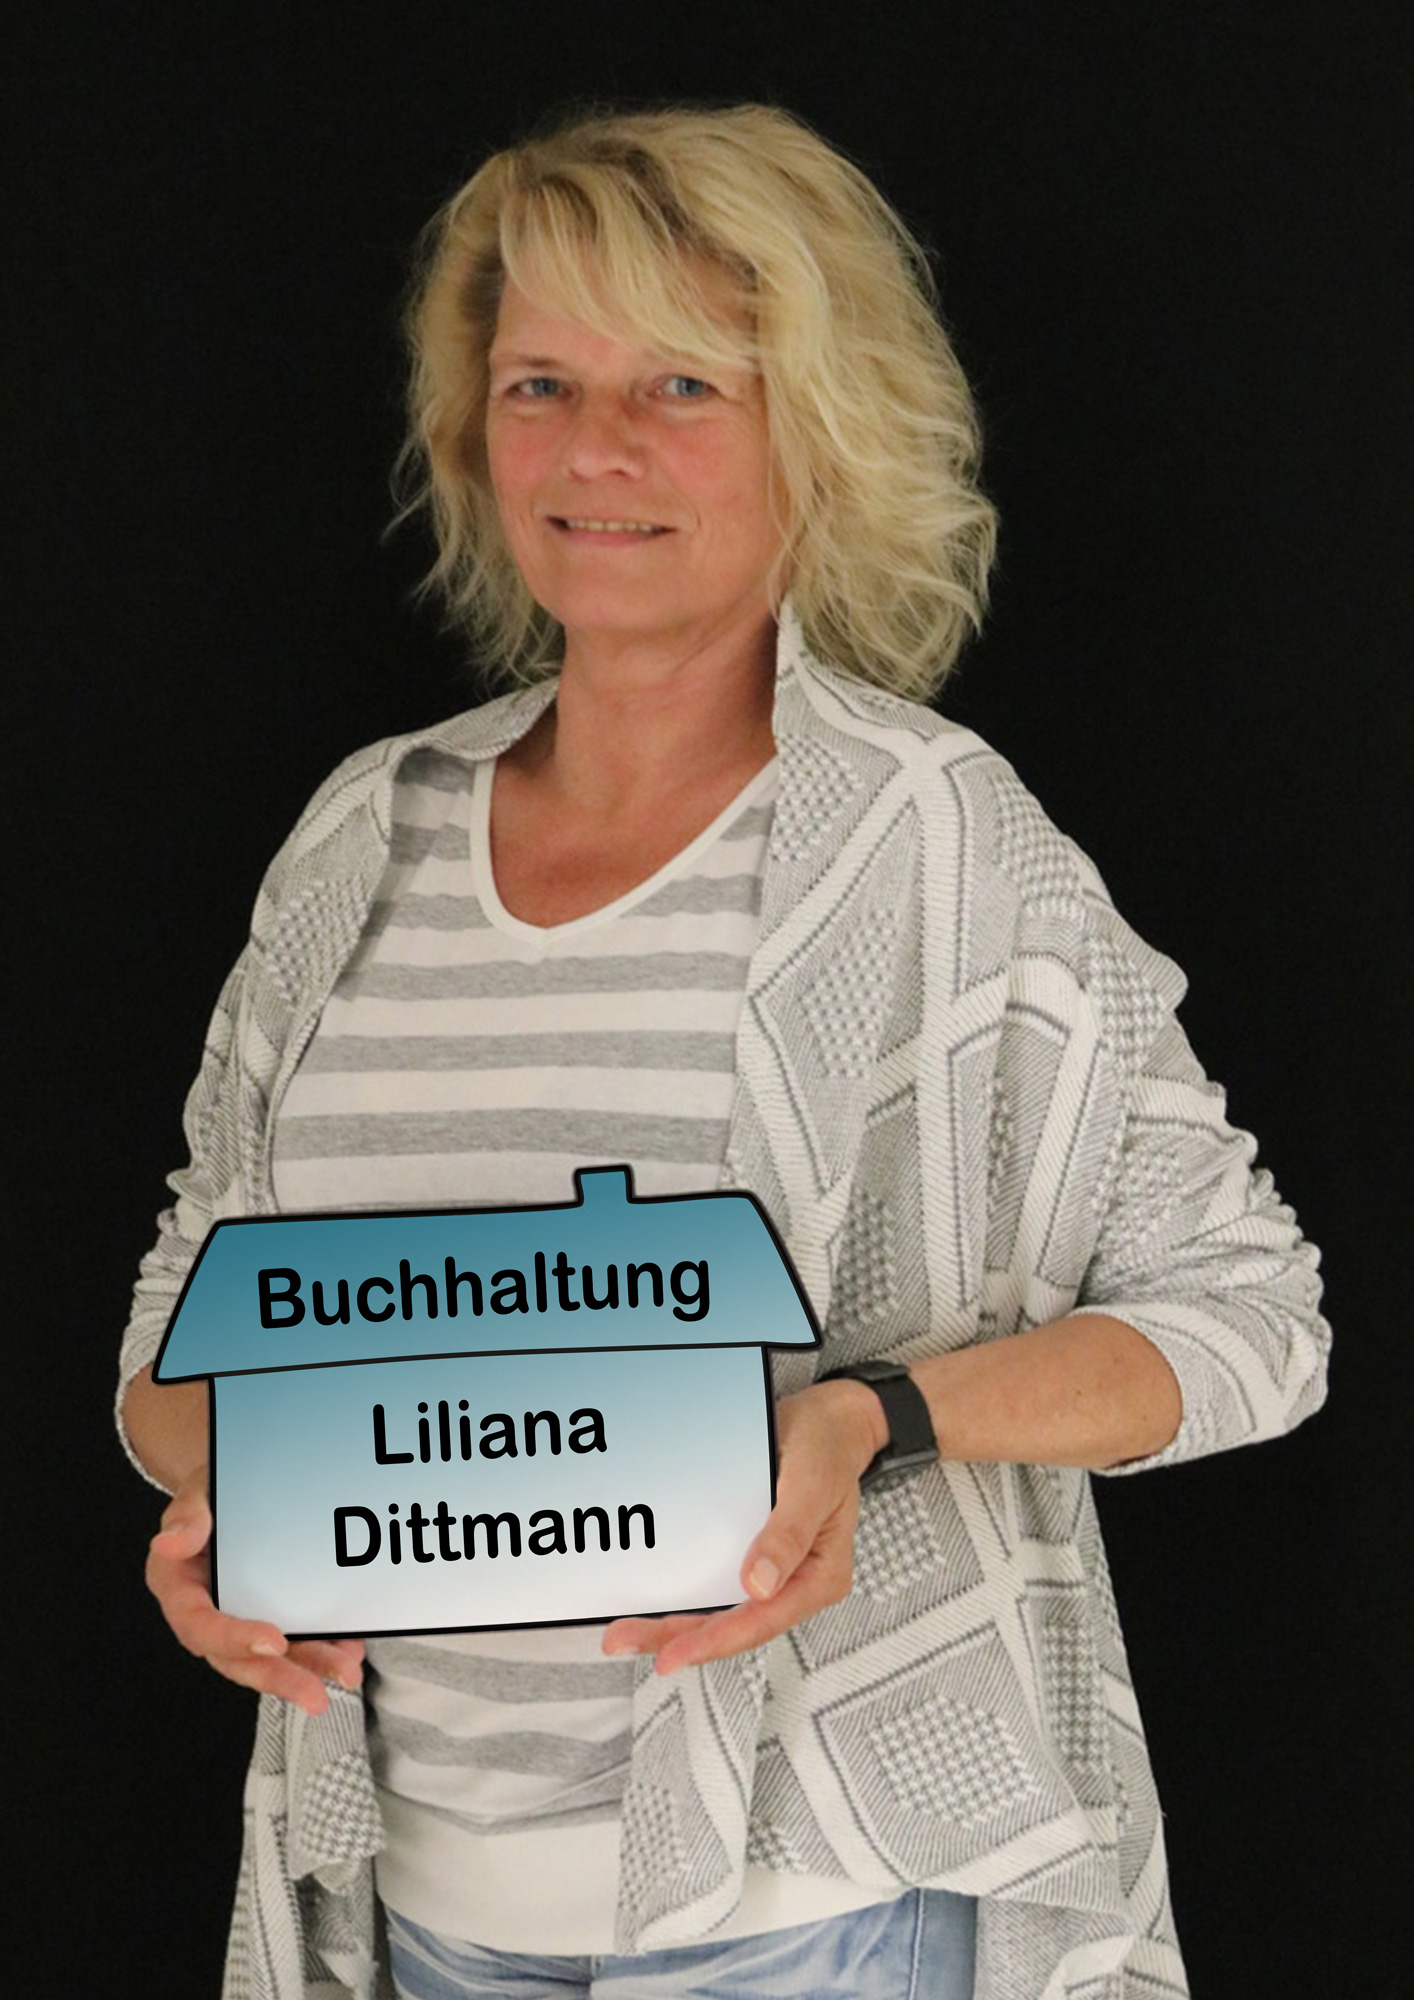 Liliana Dittmann